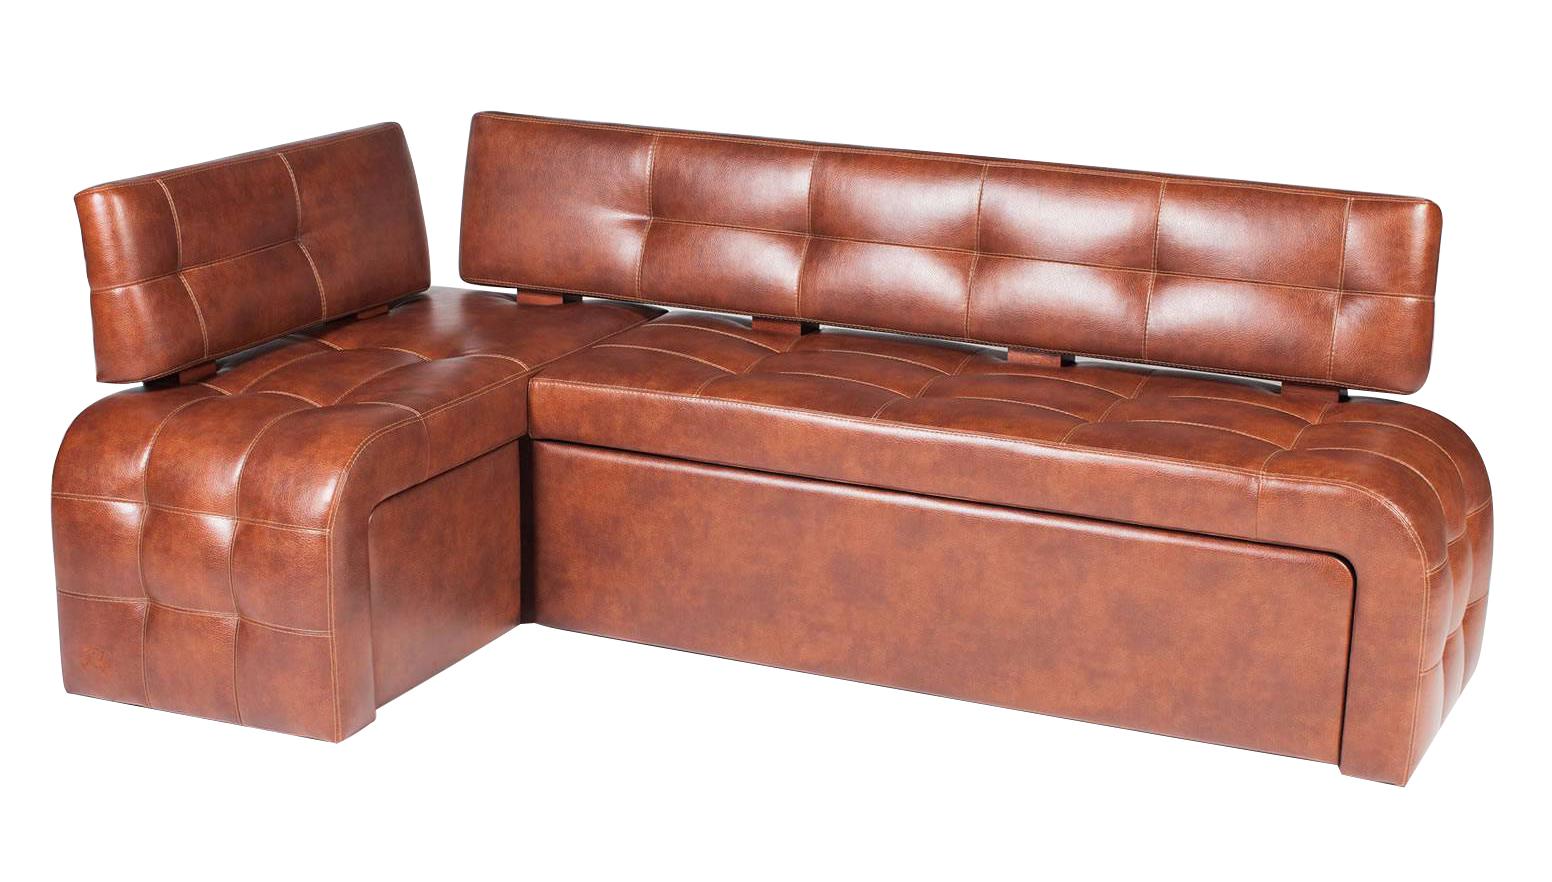 Кухонный угловой диван Бристоль — Угловой диван Бристоль